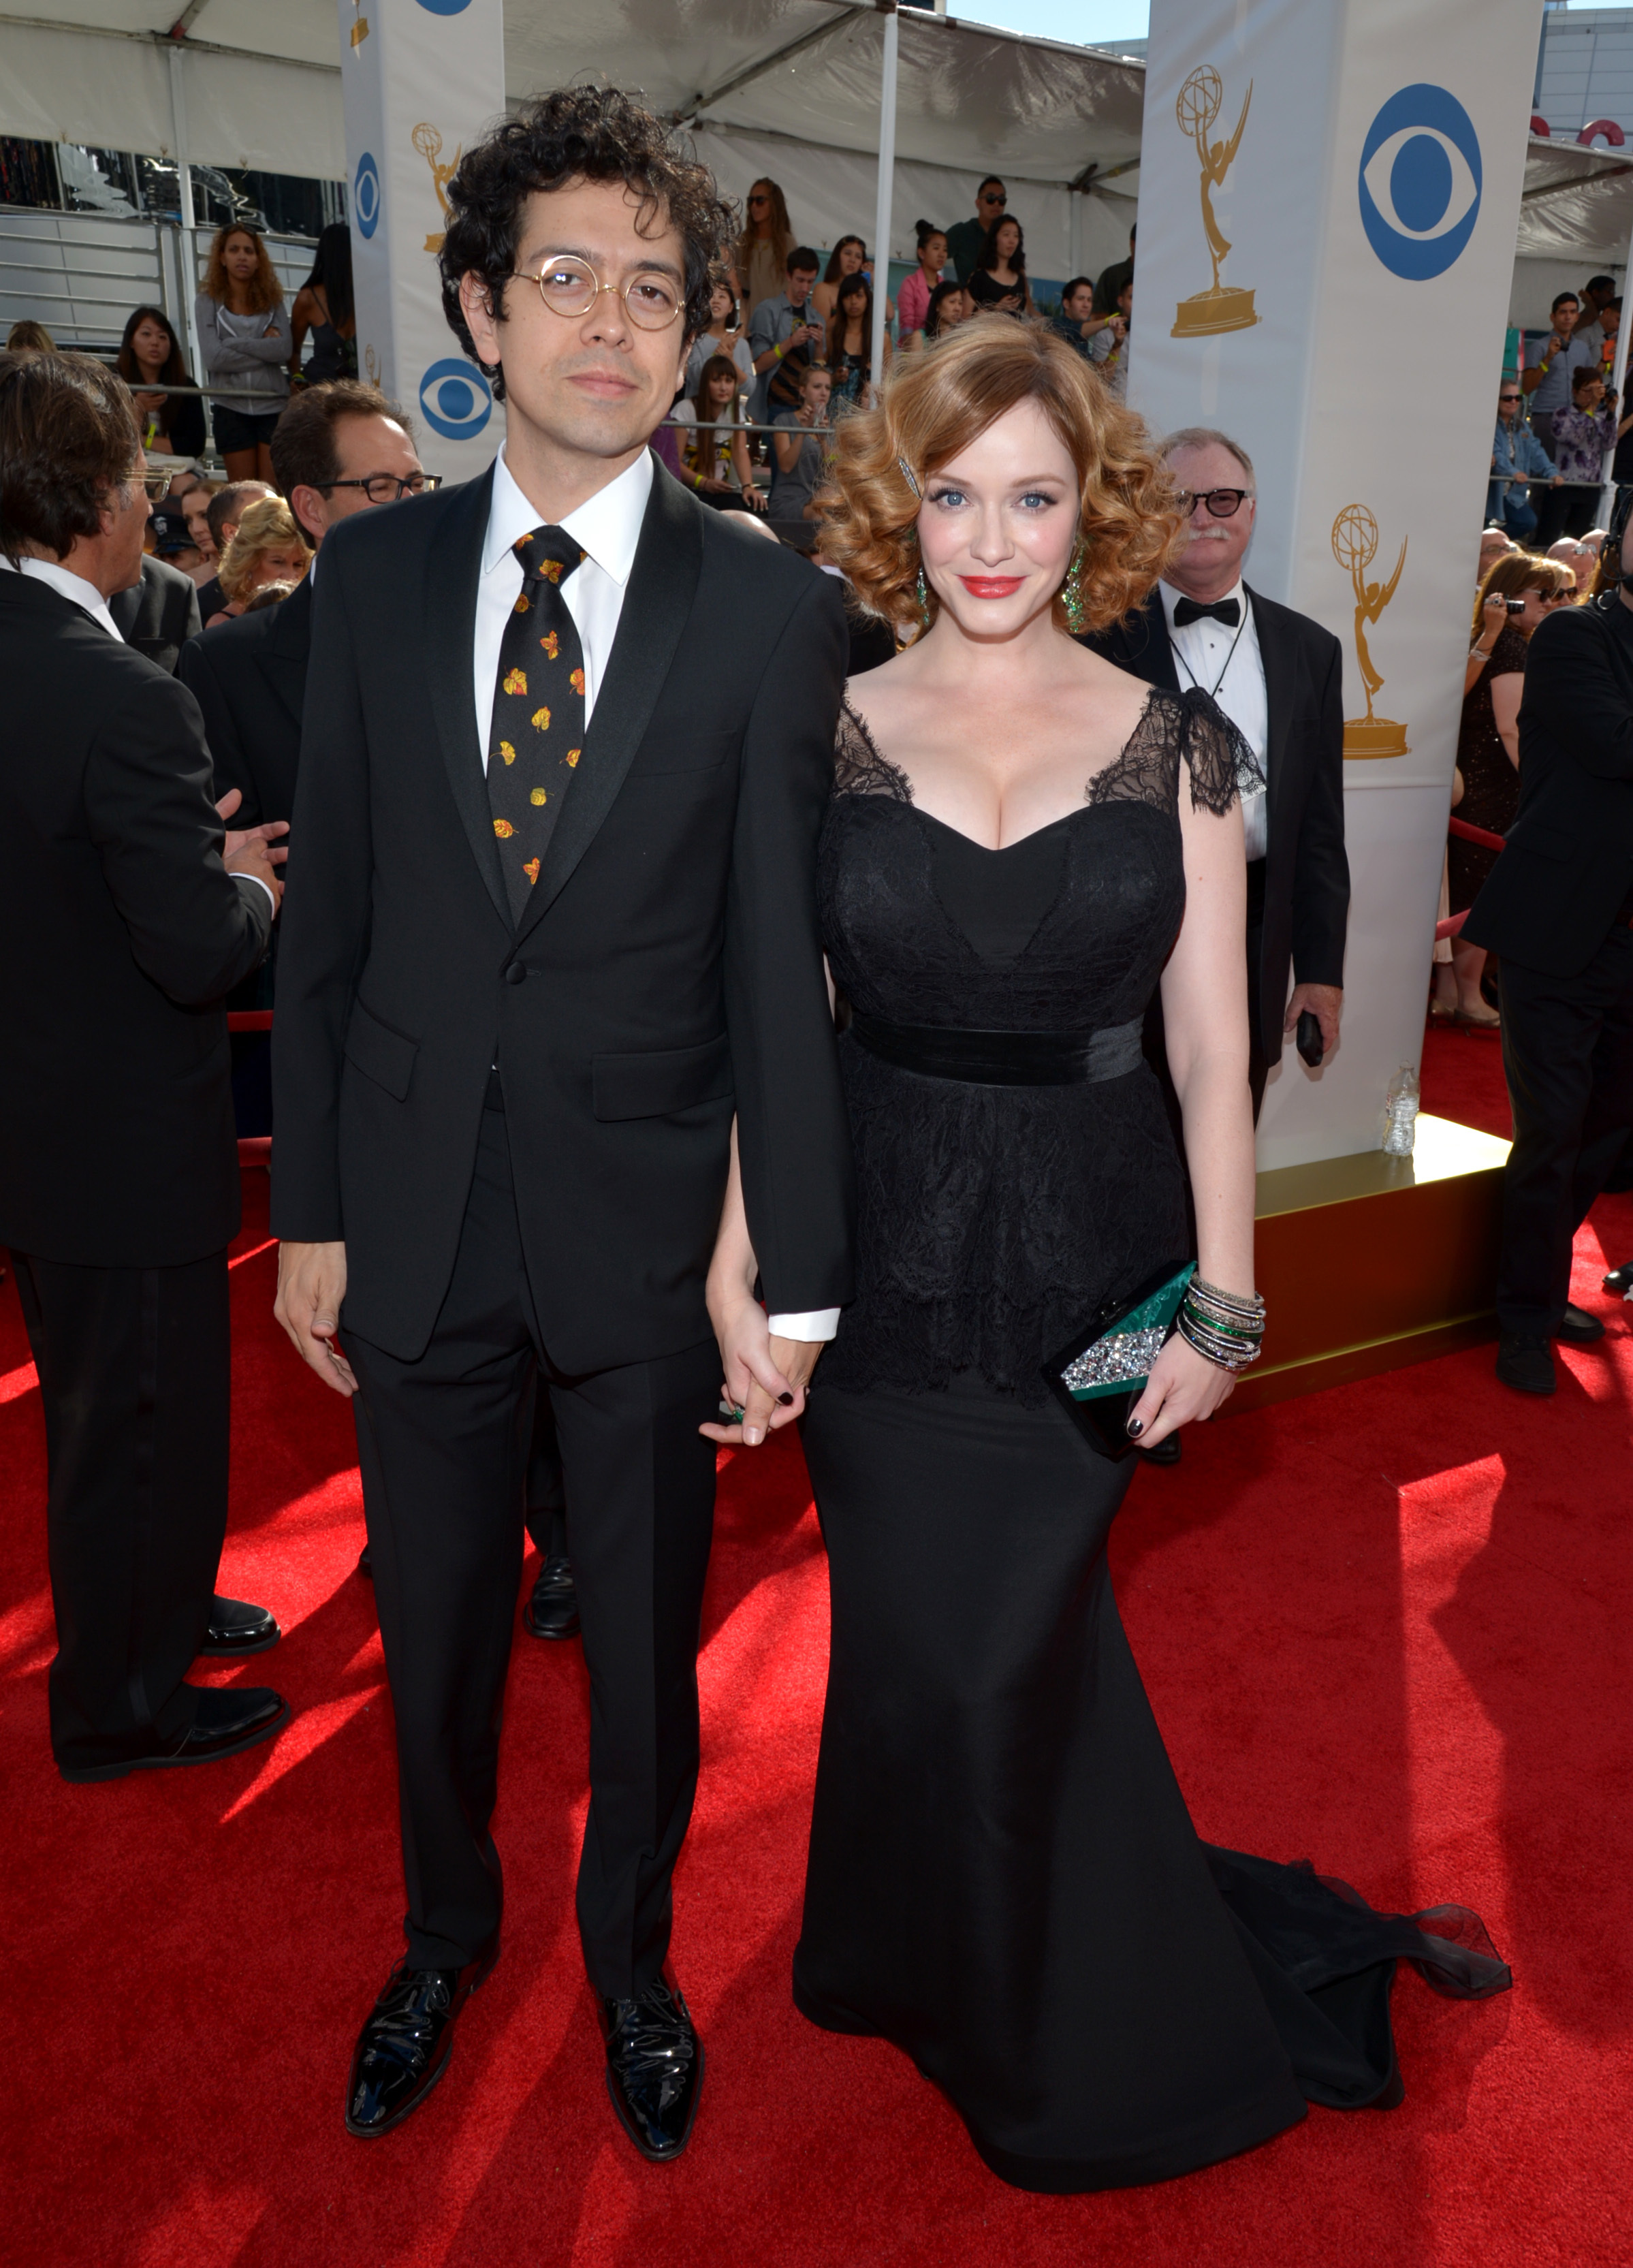 Emmy awards 2013 couples best dressed hot couple hottest tv